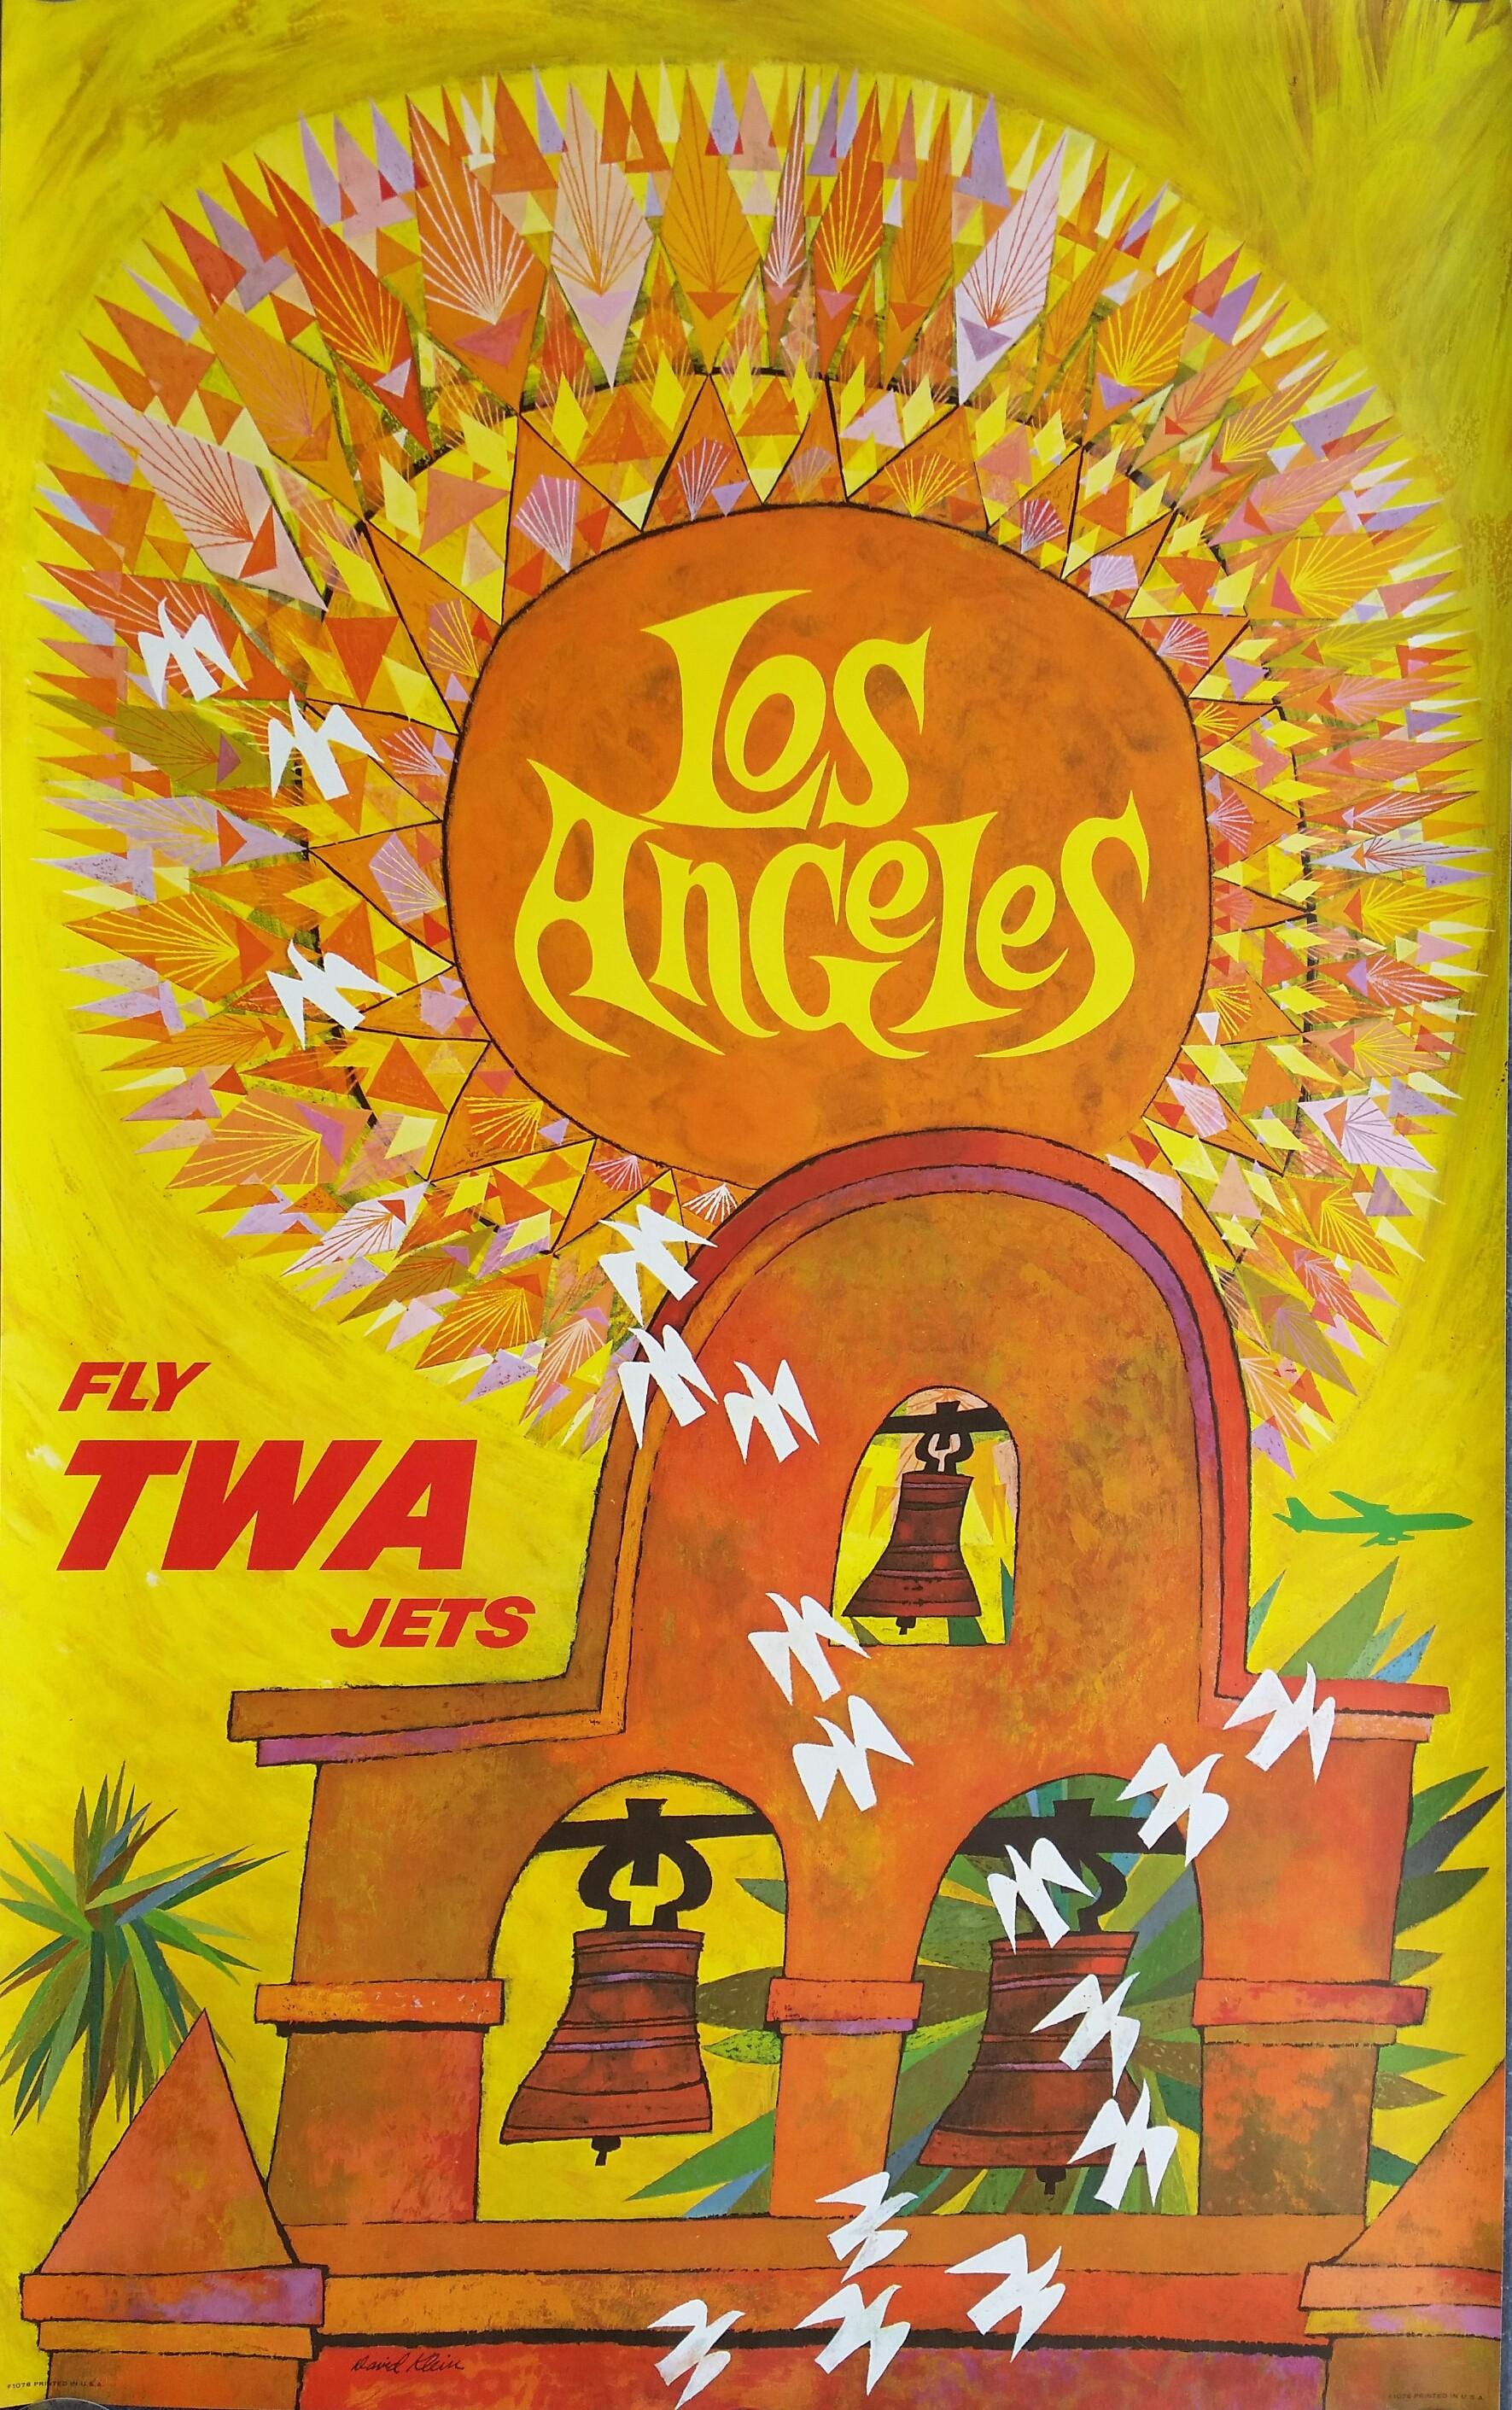 Original Vintage Poster Fly TWA Jets LOS ANGELES David KLEIN - Los angeles posters vintage